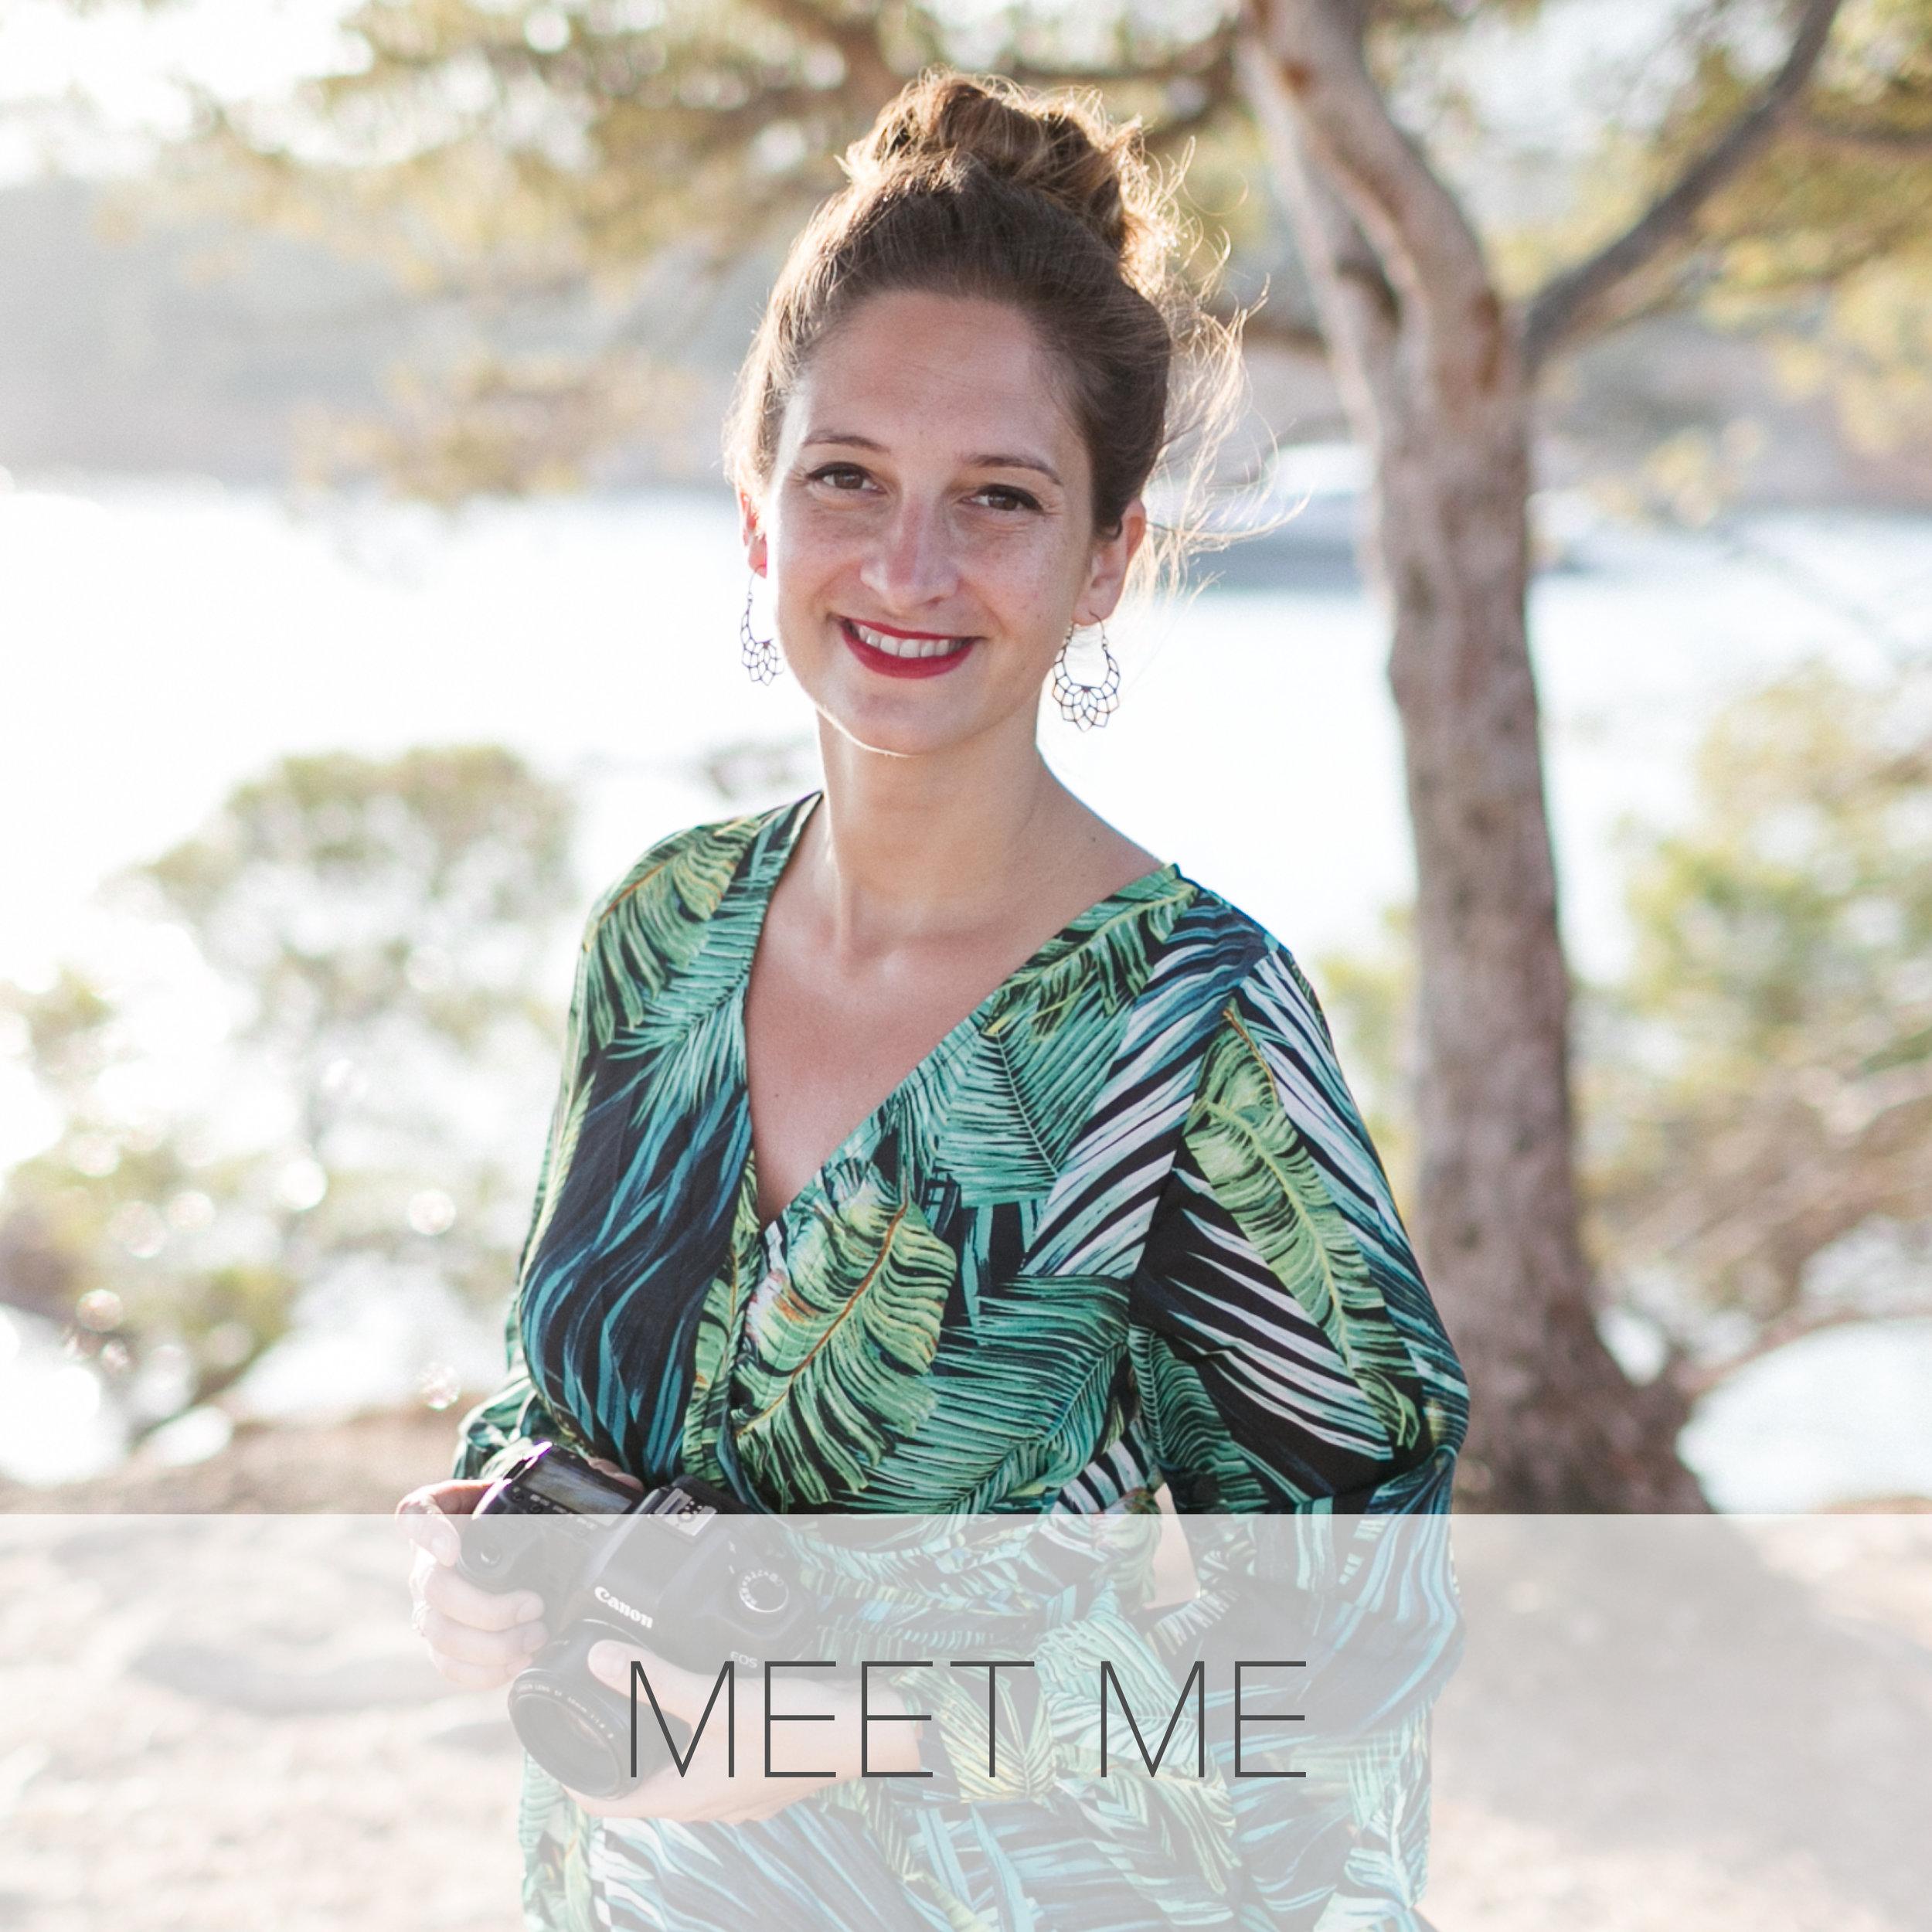 meetme-about-susanne_wysocki-weddings.jpg